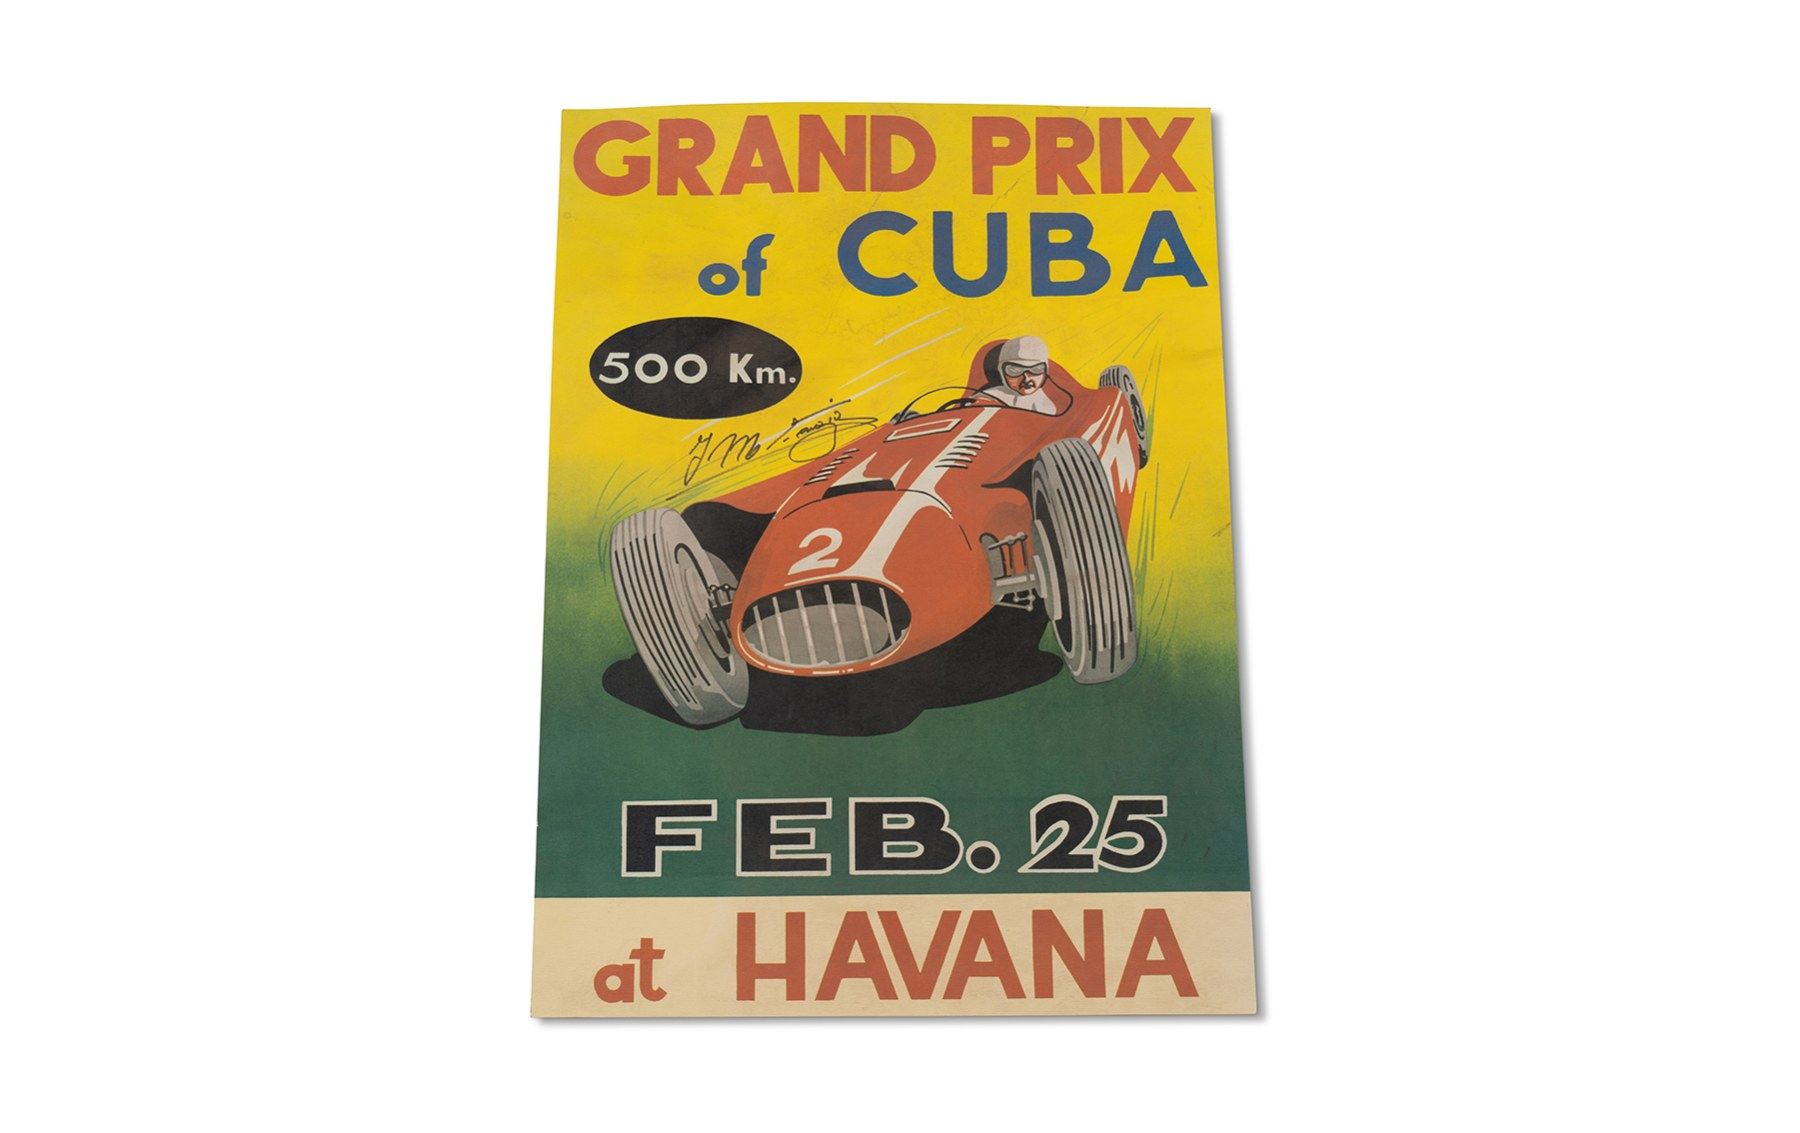 1958 Grand Prix of Cuba Poster, Signed by Juan Manuel Fangio